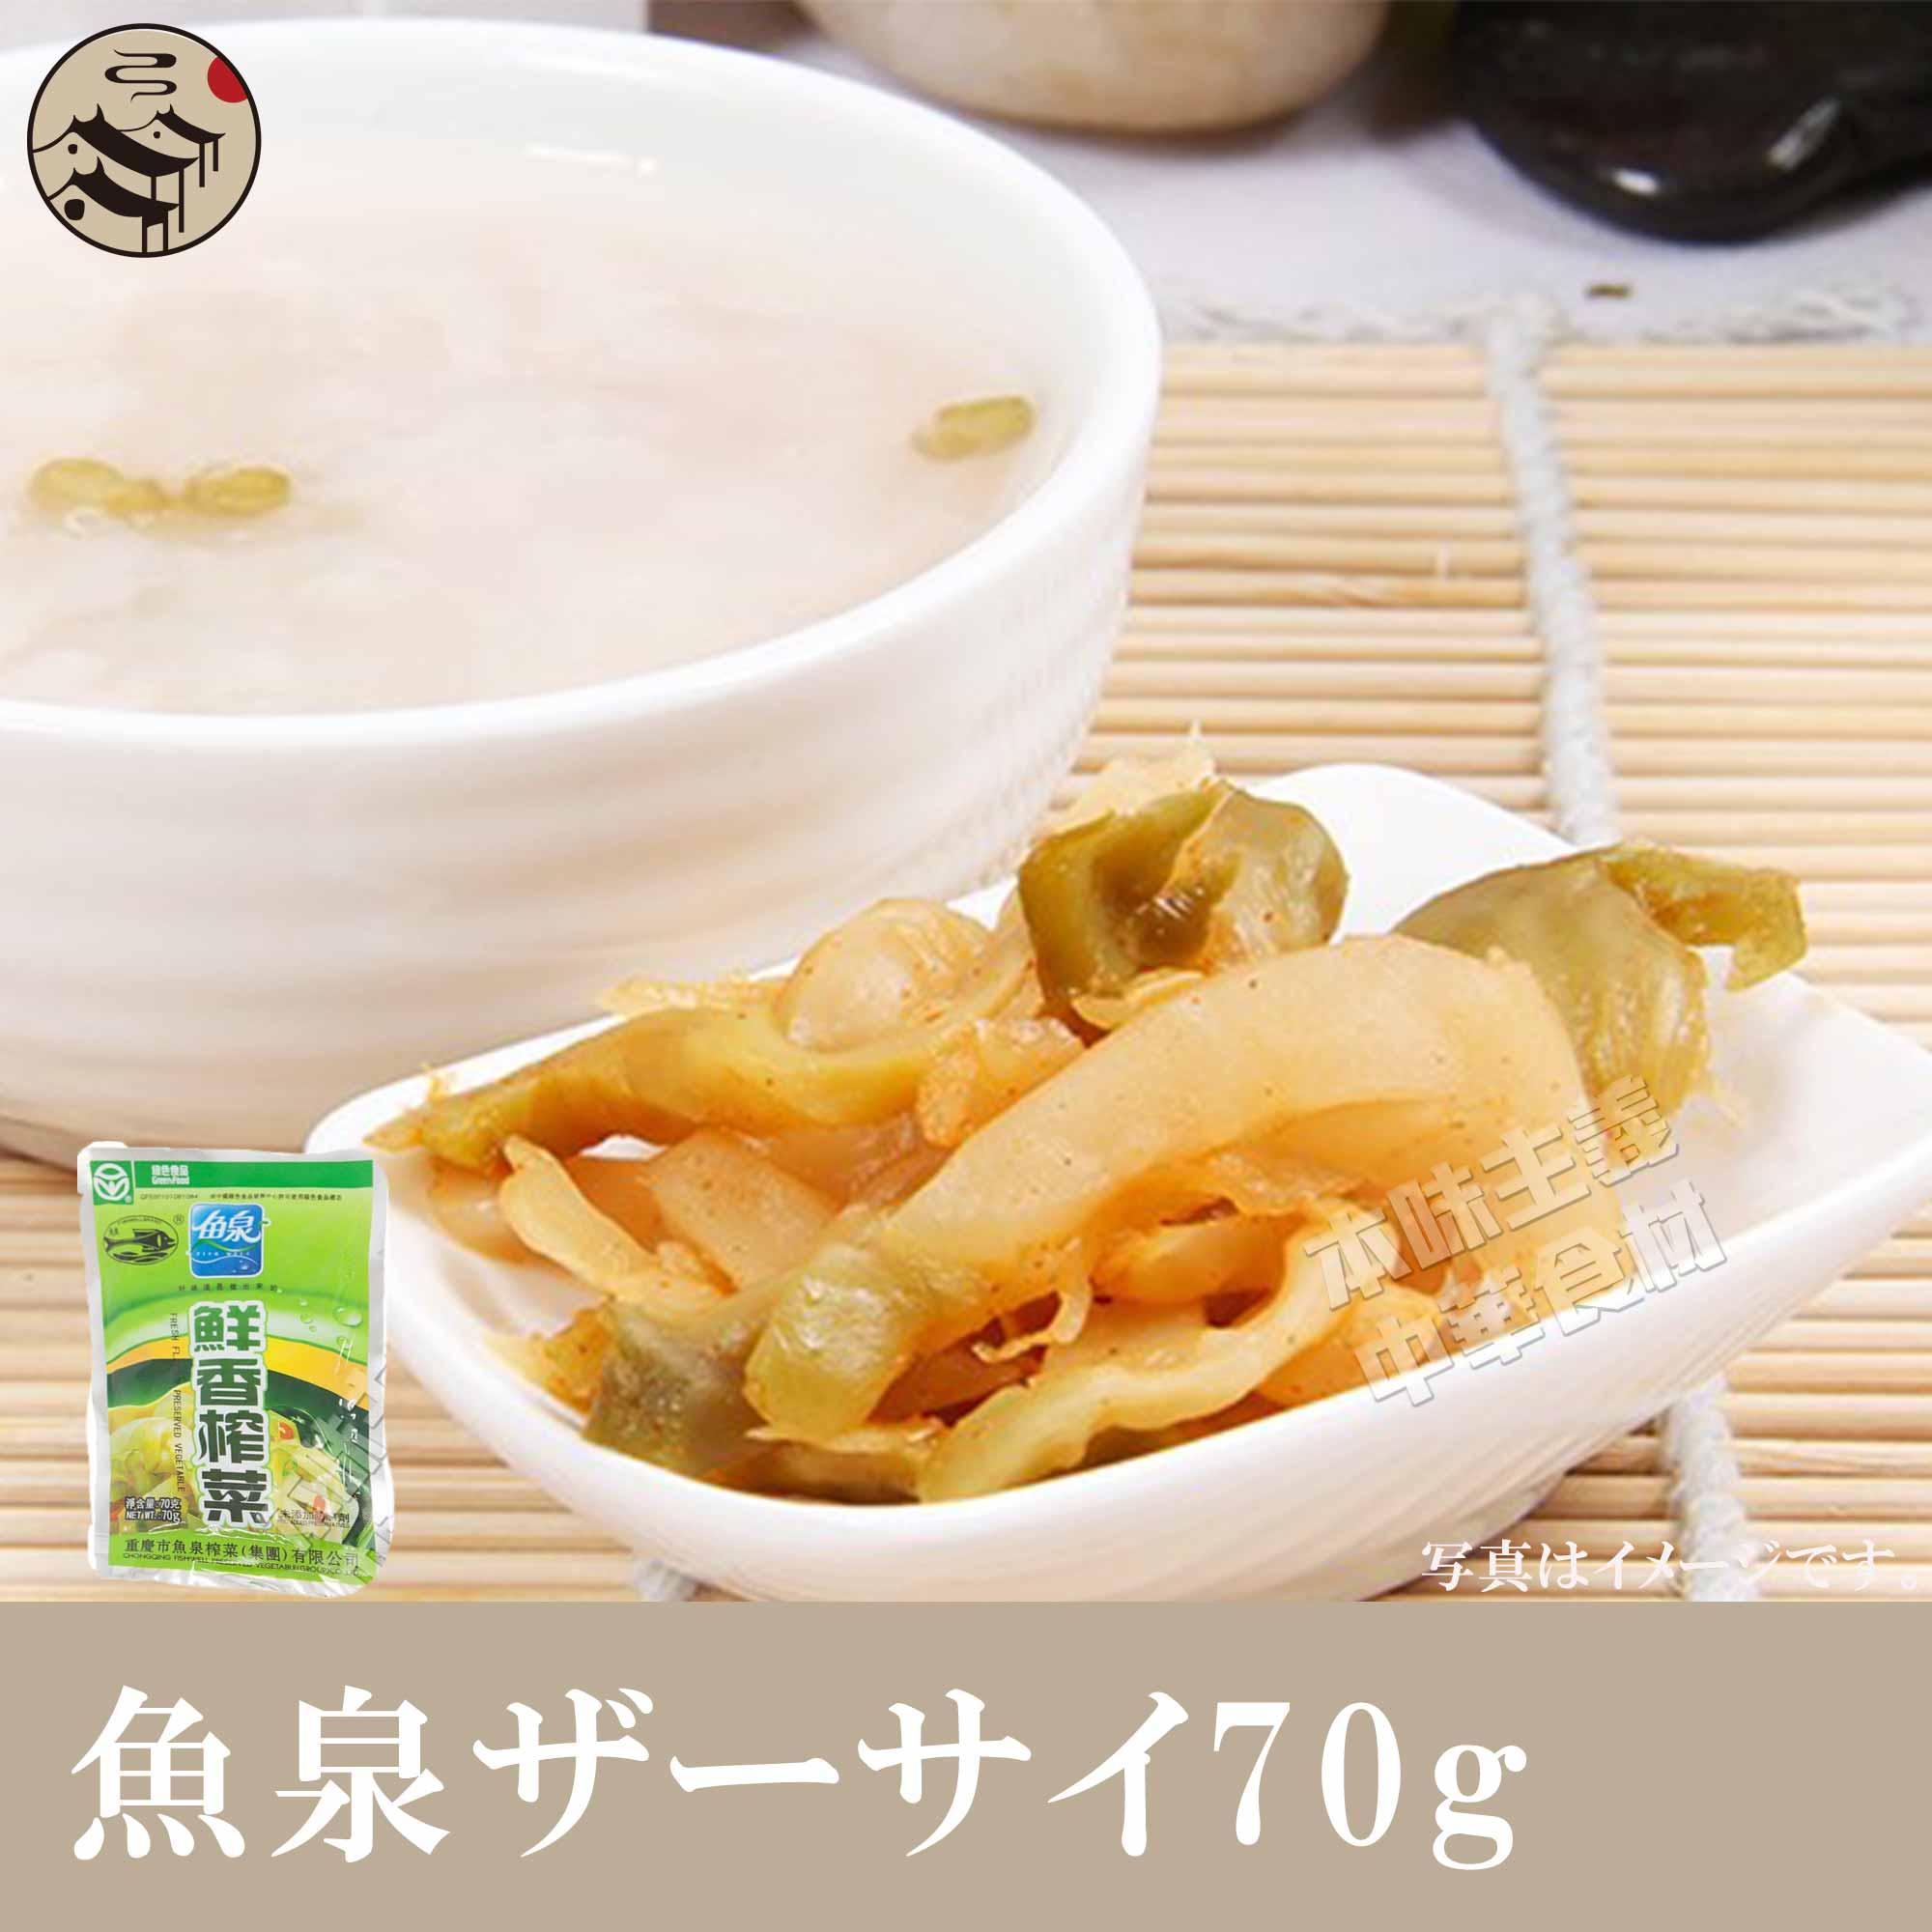 大人気!魚泉 ザーサイ(一等品) 70g 中華漬物